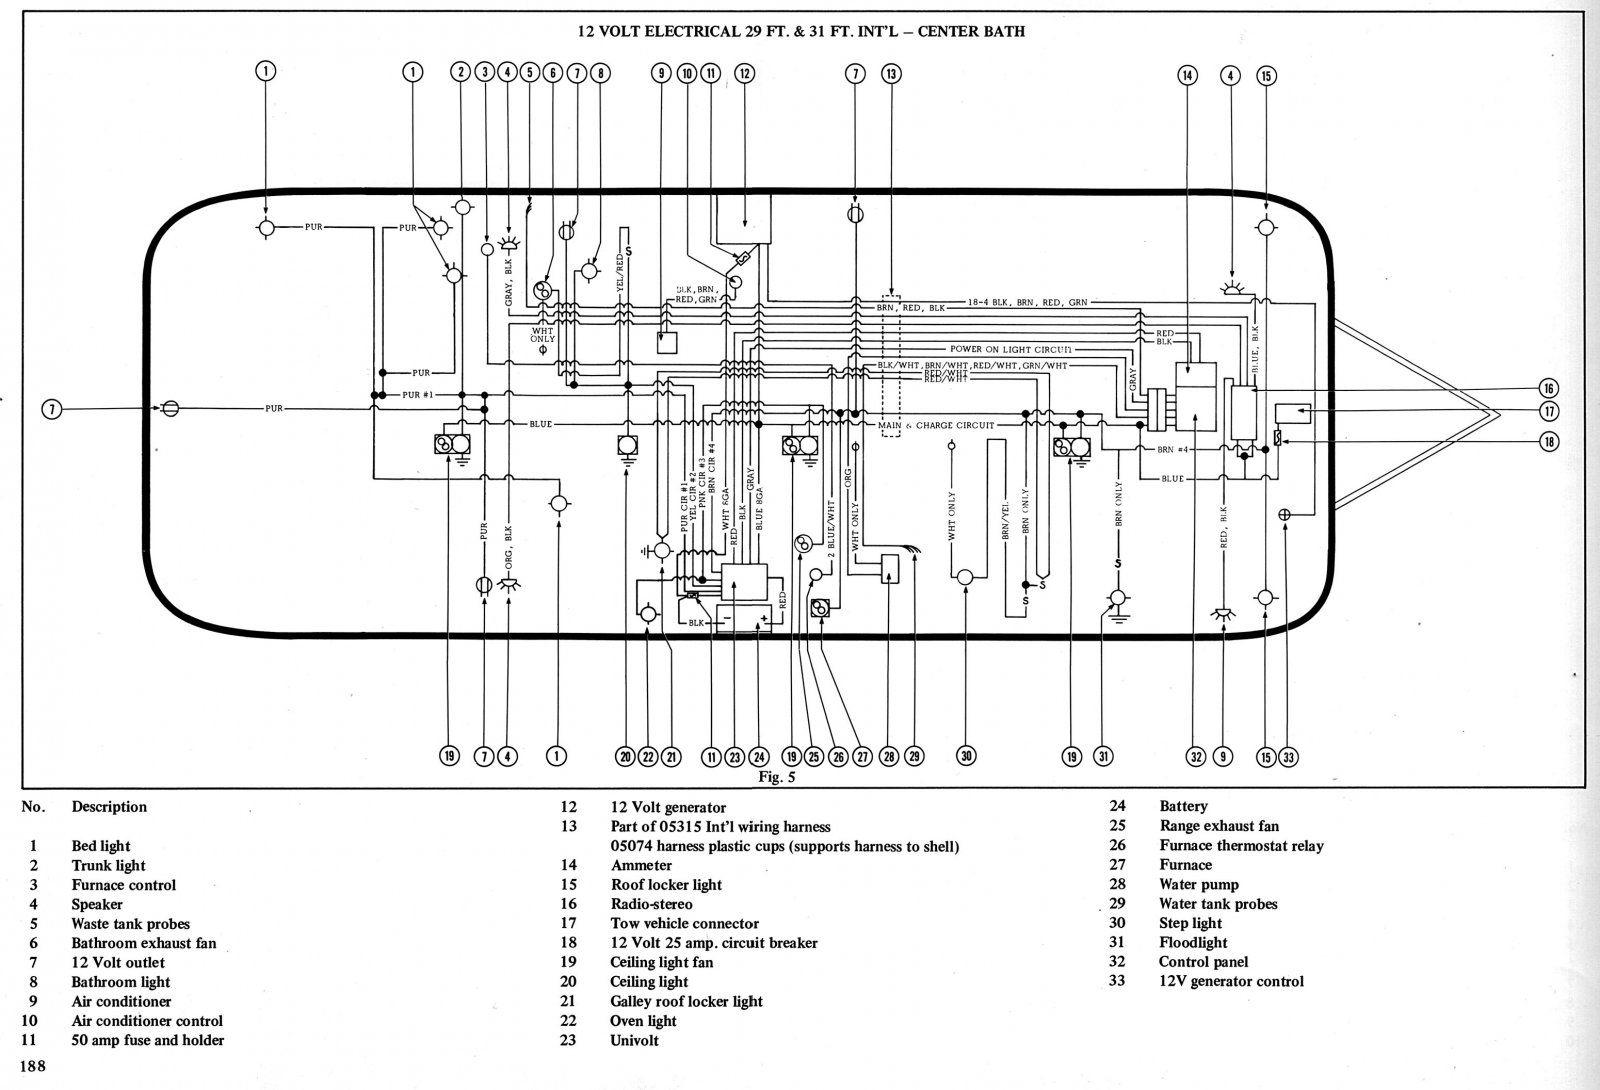 Electrical 12v Cntr Bath Sovereign 1973 Jpg  1600 X 1090